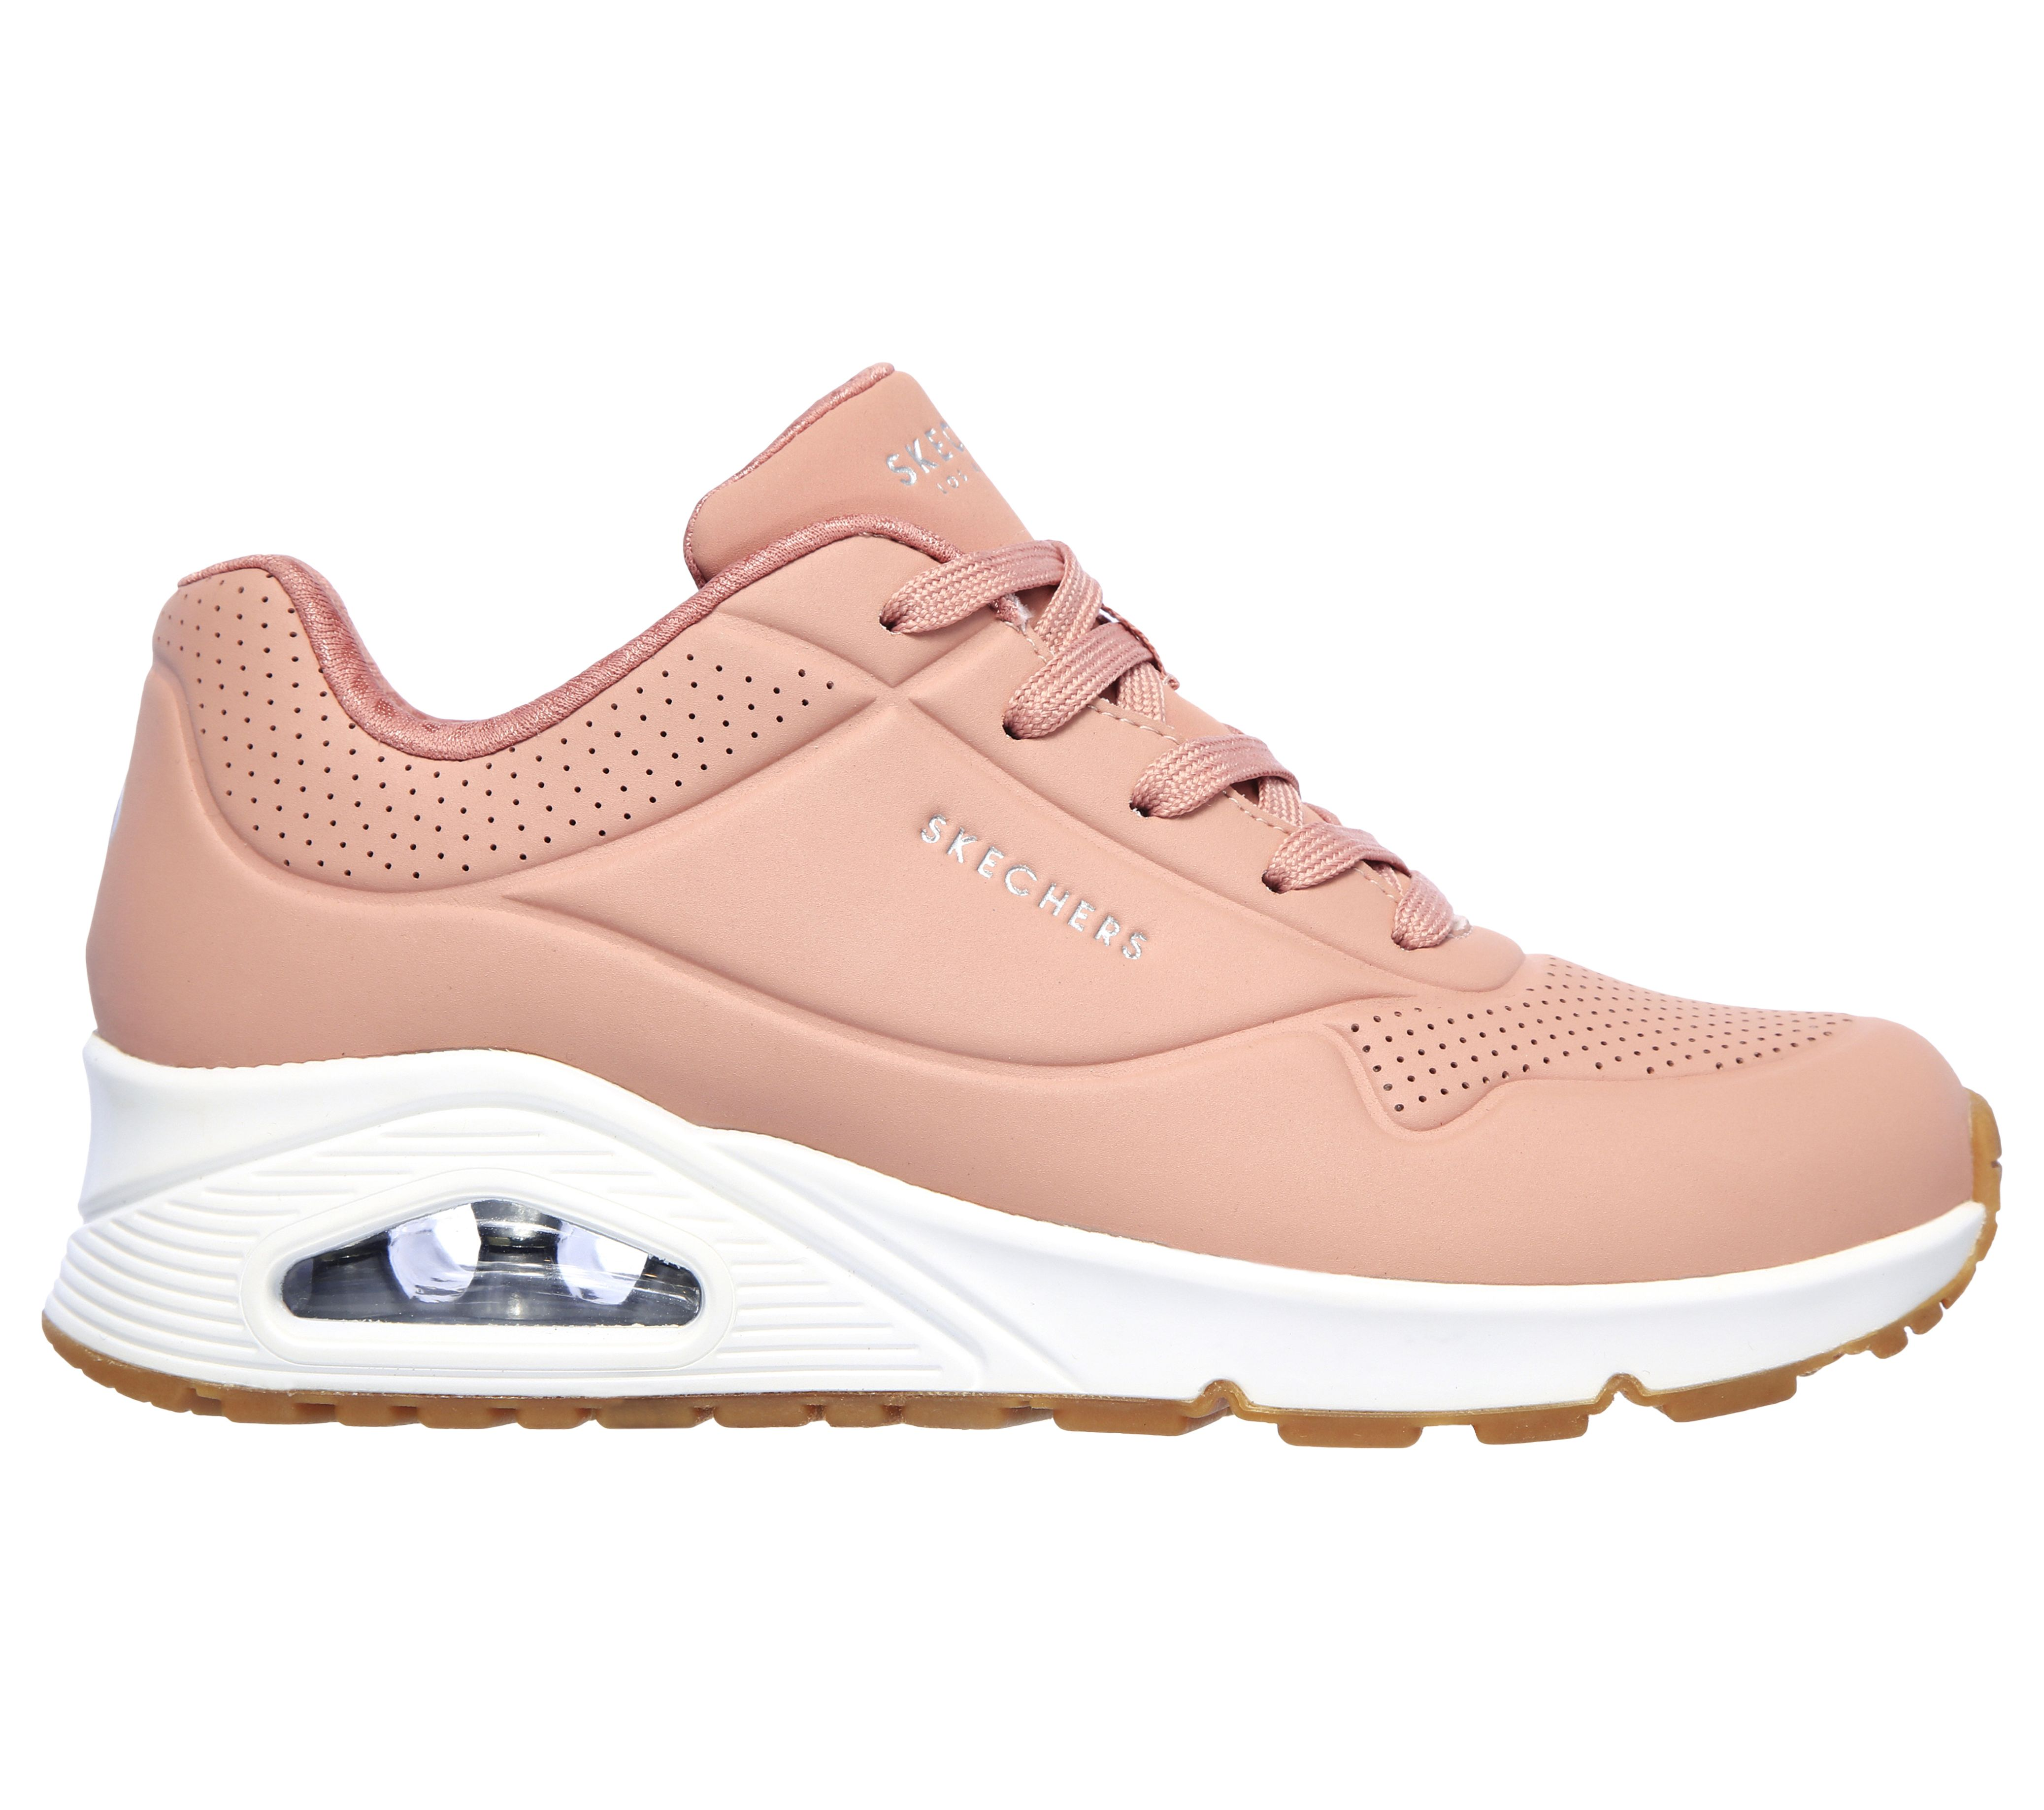 zapatos skechers 2018 new westminster largo rosa